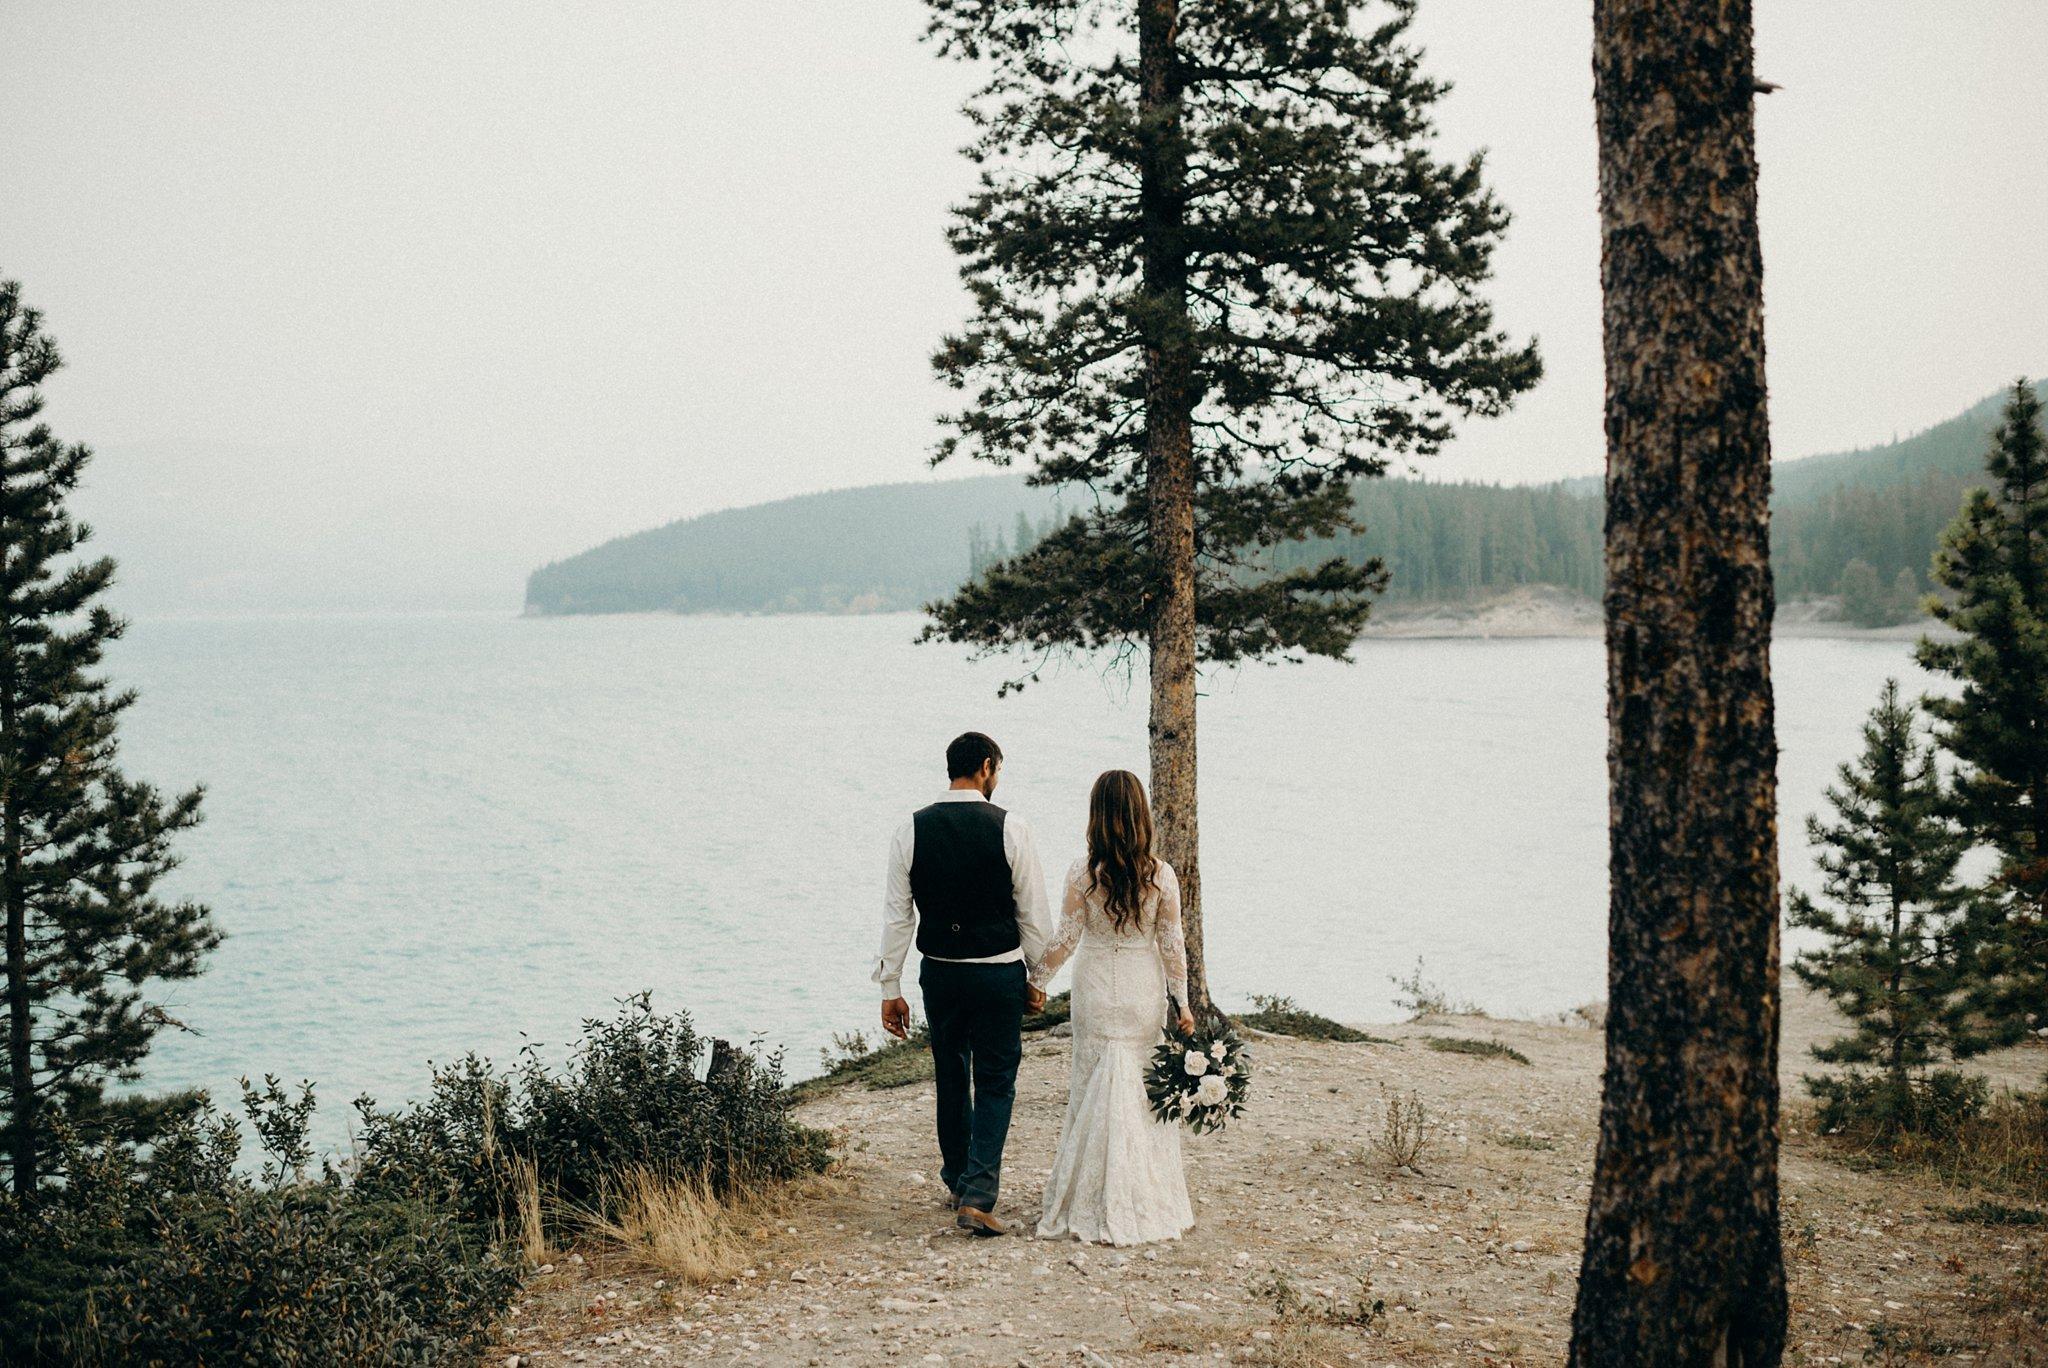 kaihla_tonai_intimate_wedding_elopement_photographer_6736.jpg